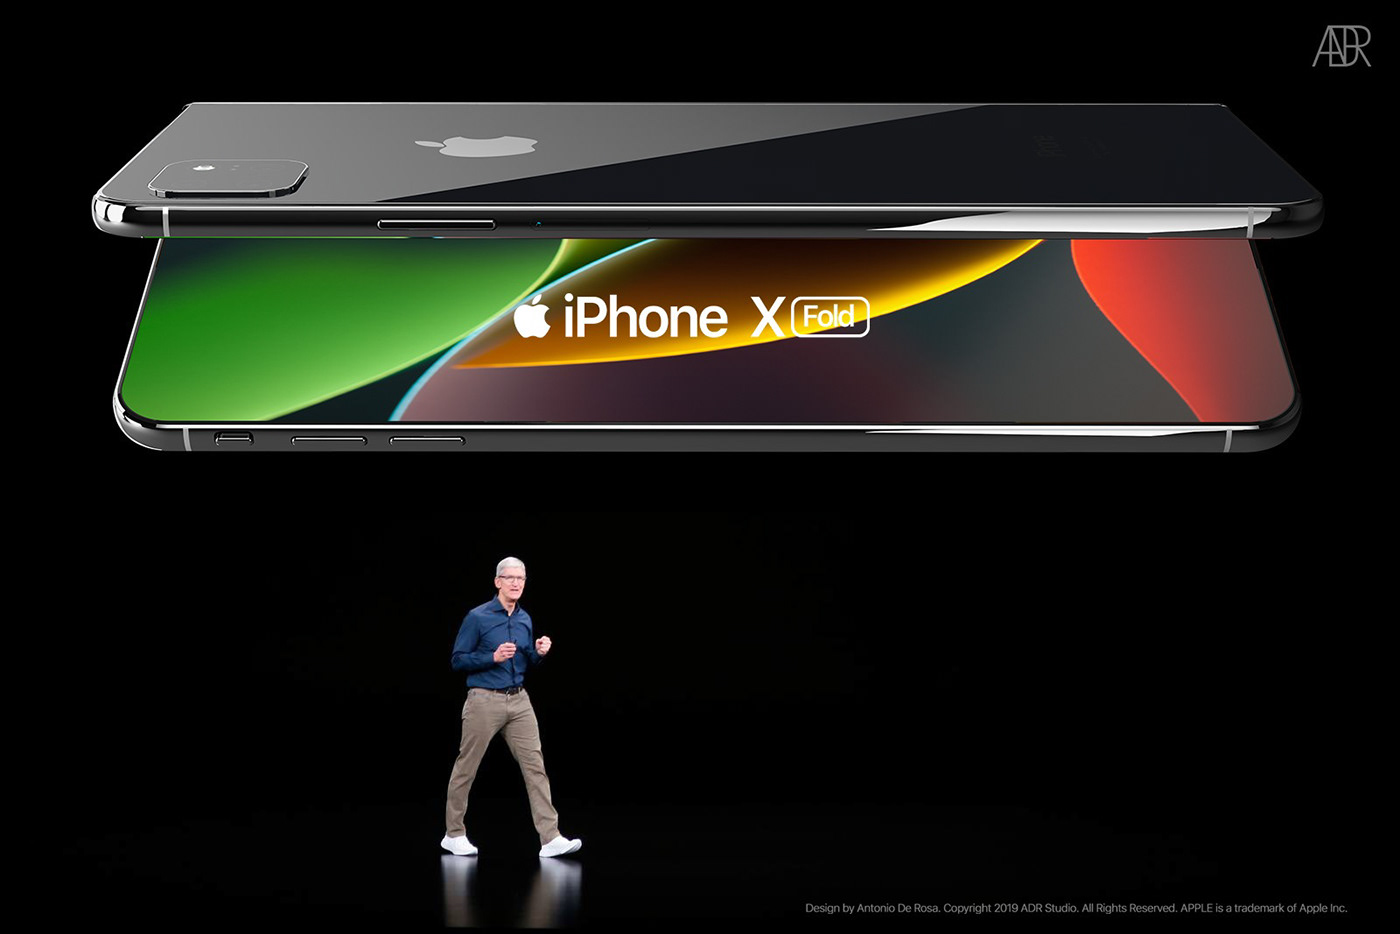 apple iphone fold iphone 11 iPhone XI iphone concept iphone 11 fold iphone xi fold foldable iphone Foldable smartphone